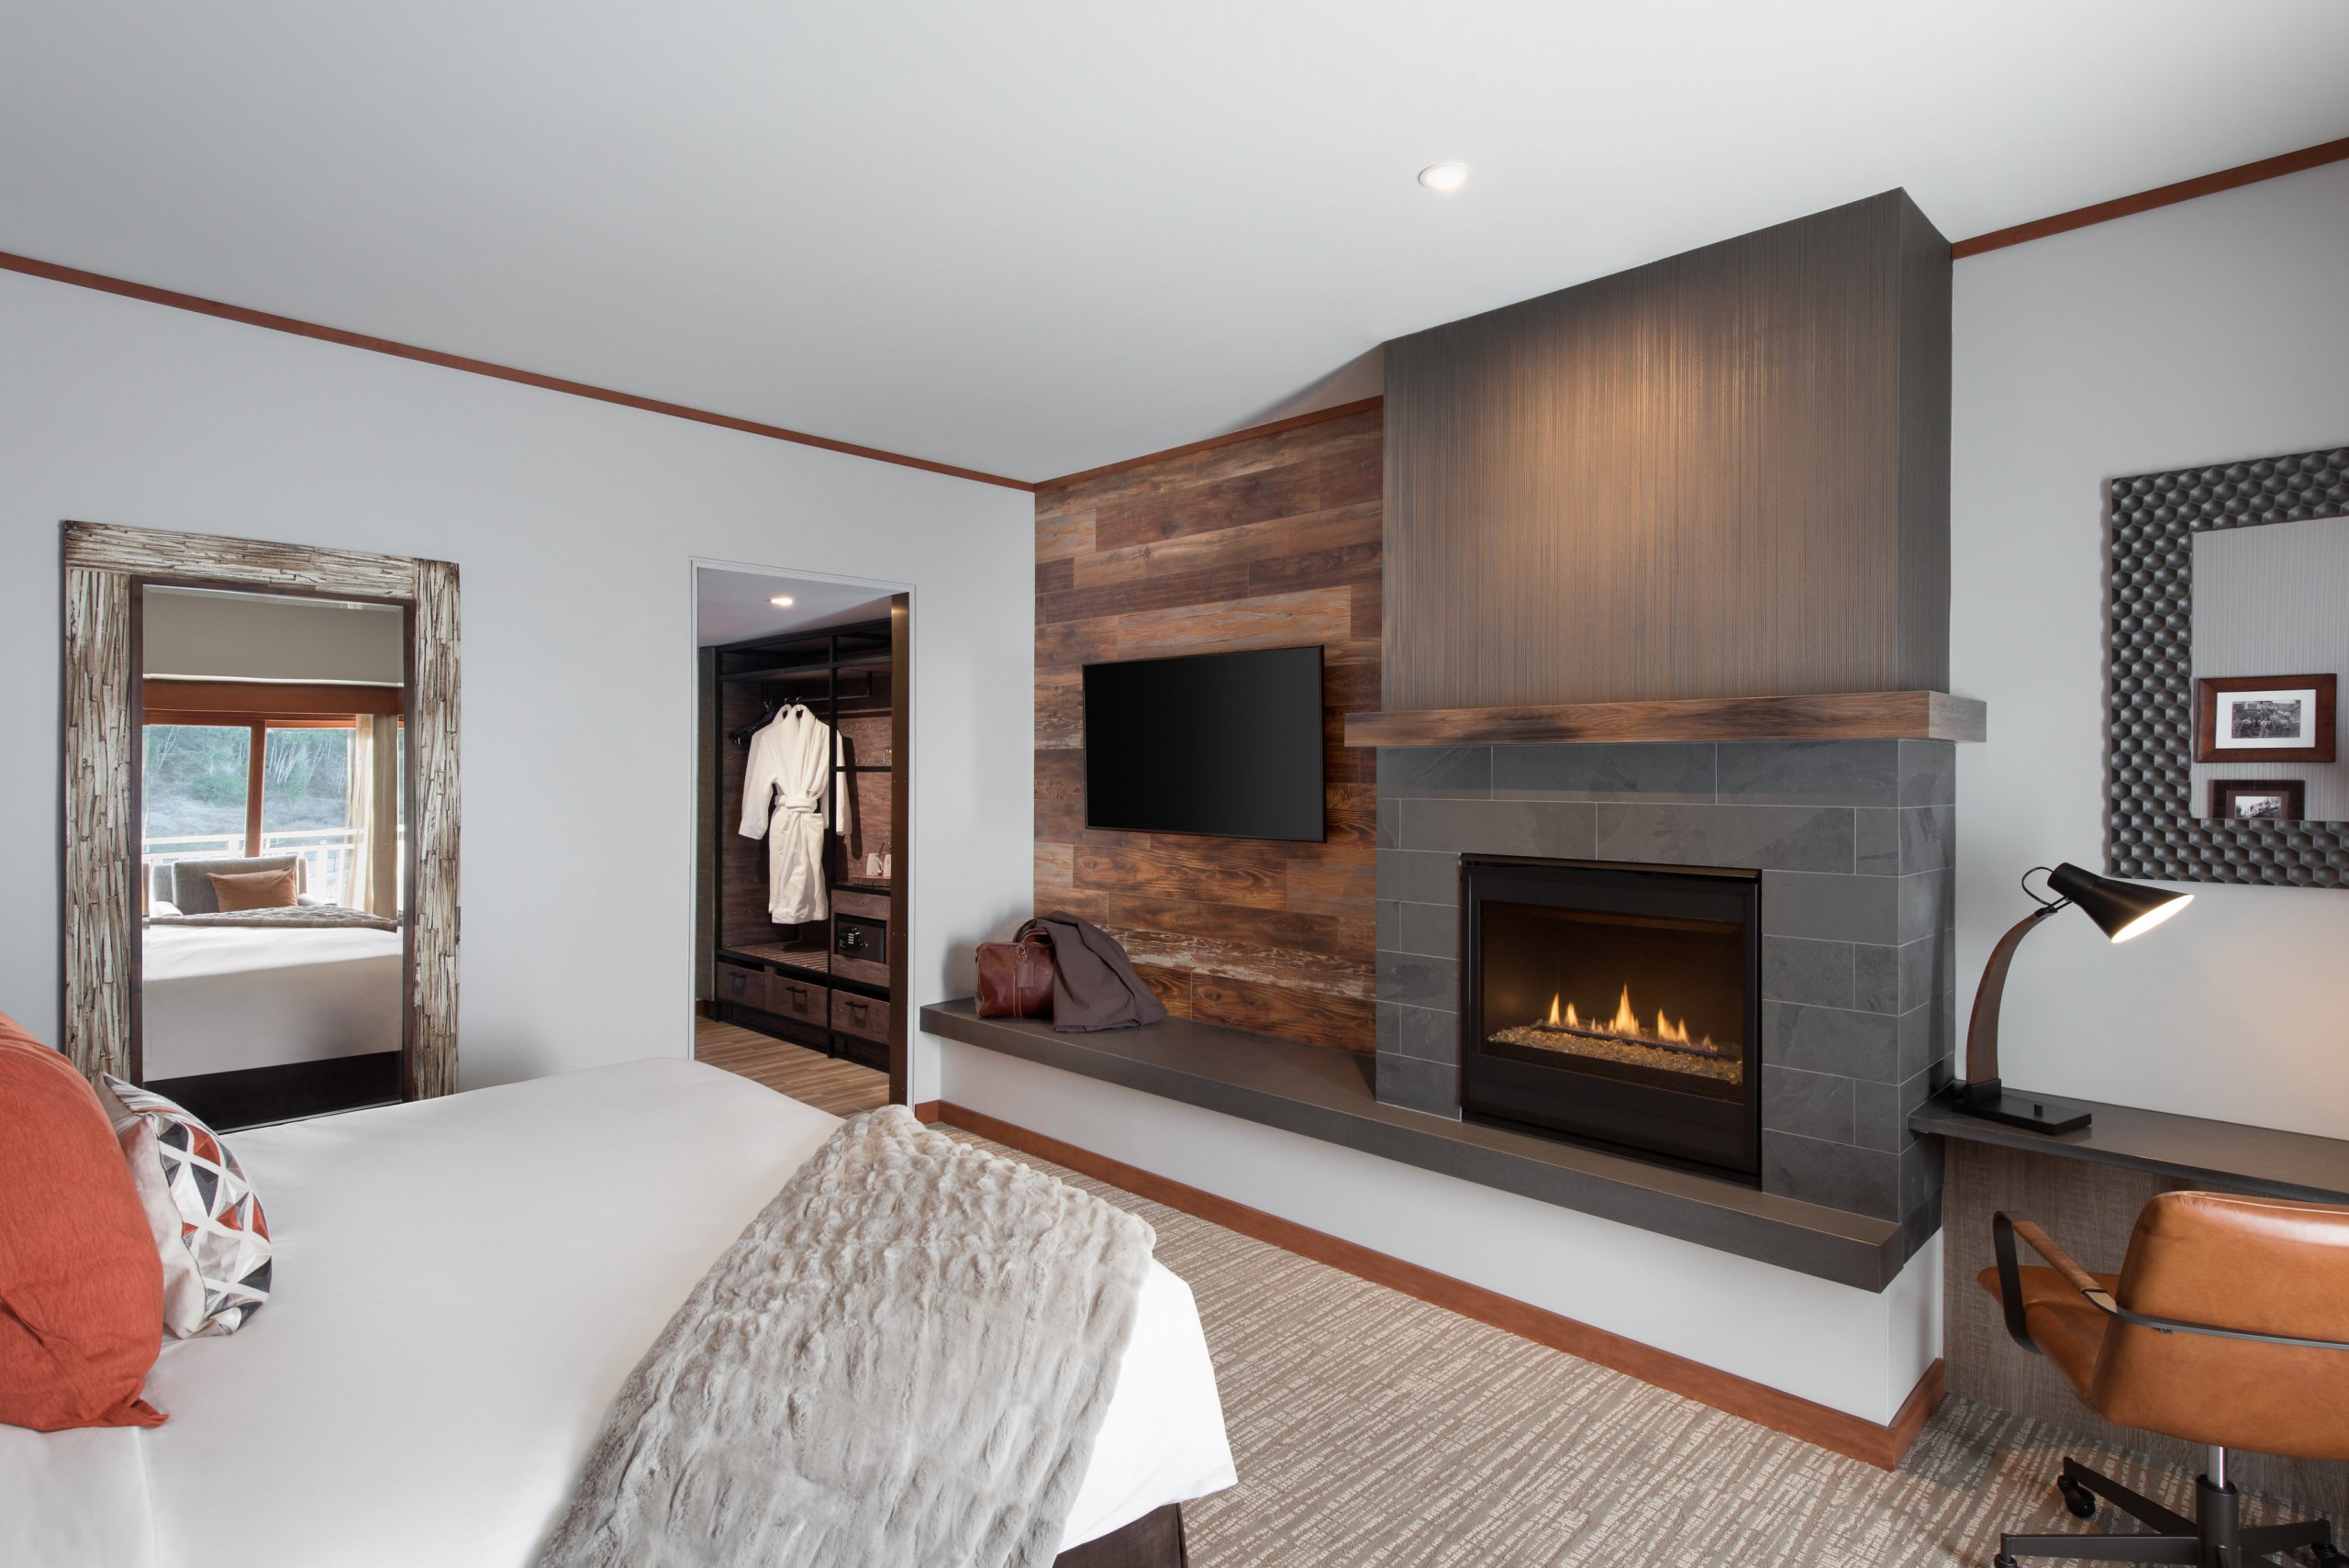 Salish Lodge & Spa Patio Guest Room | Image By Kipman Creative